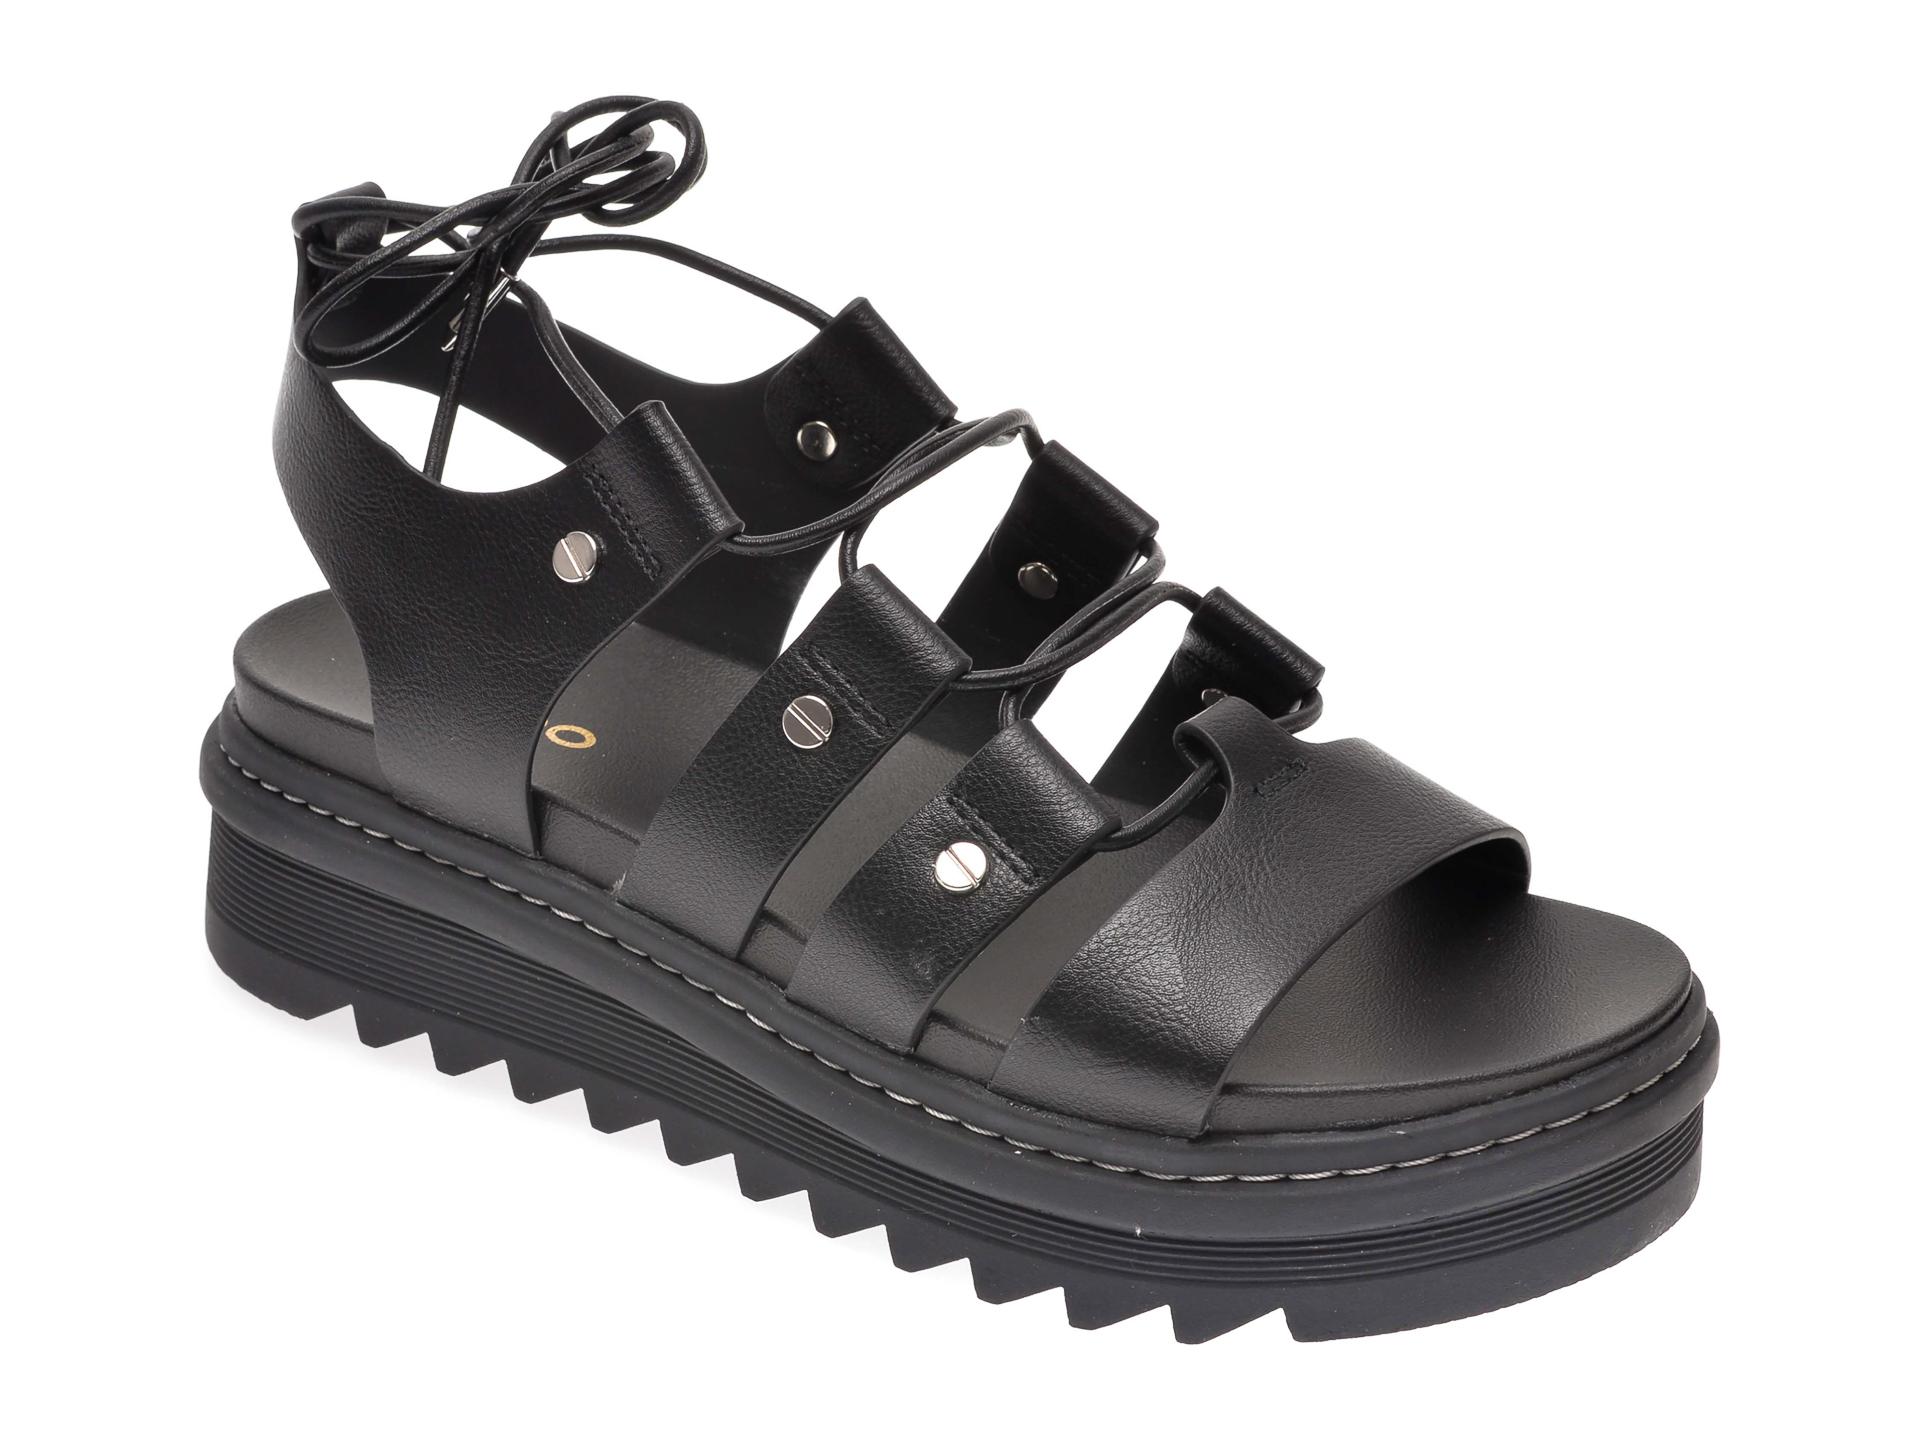 Sandale ALDO negre, Dasdez001, din piele ecologica imagine otter.ro 2021